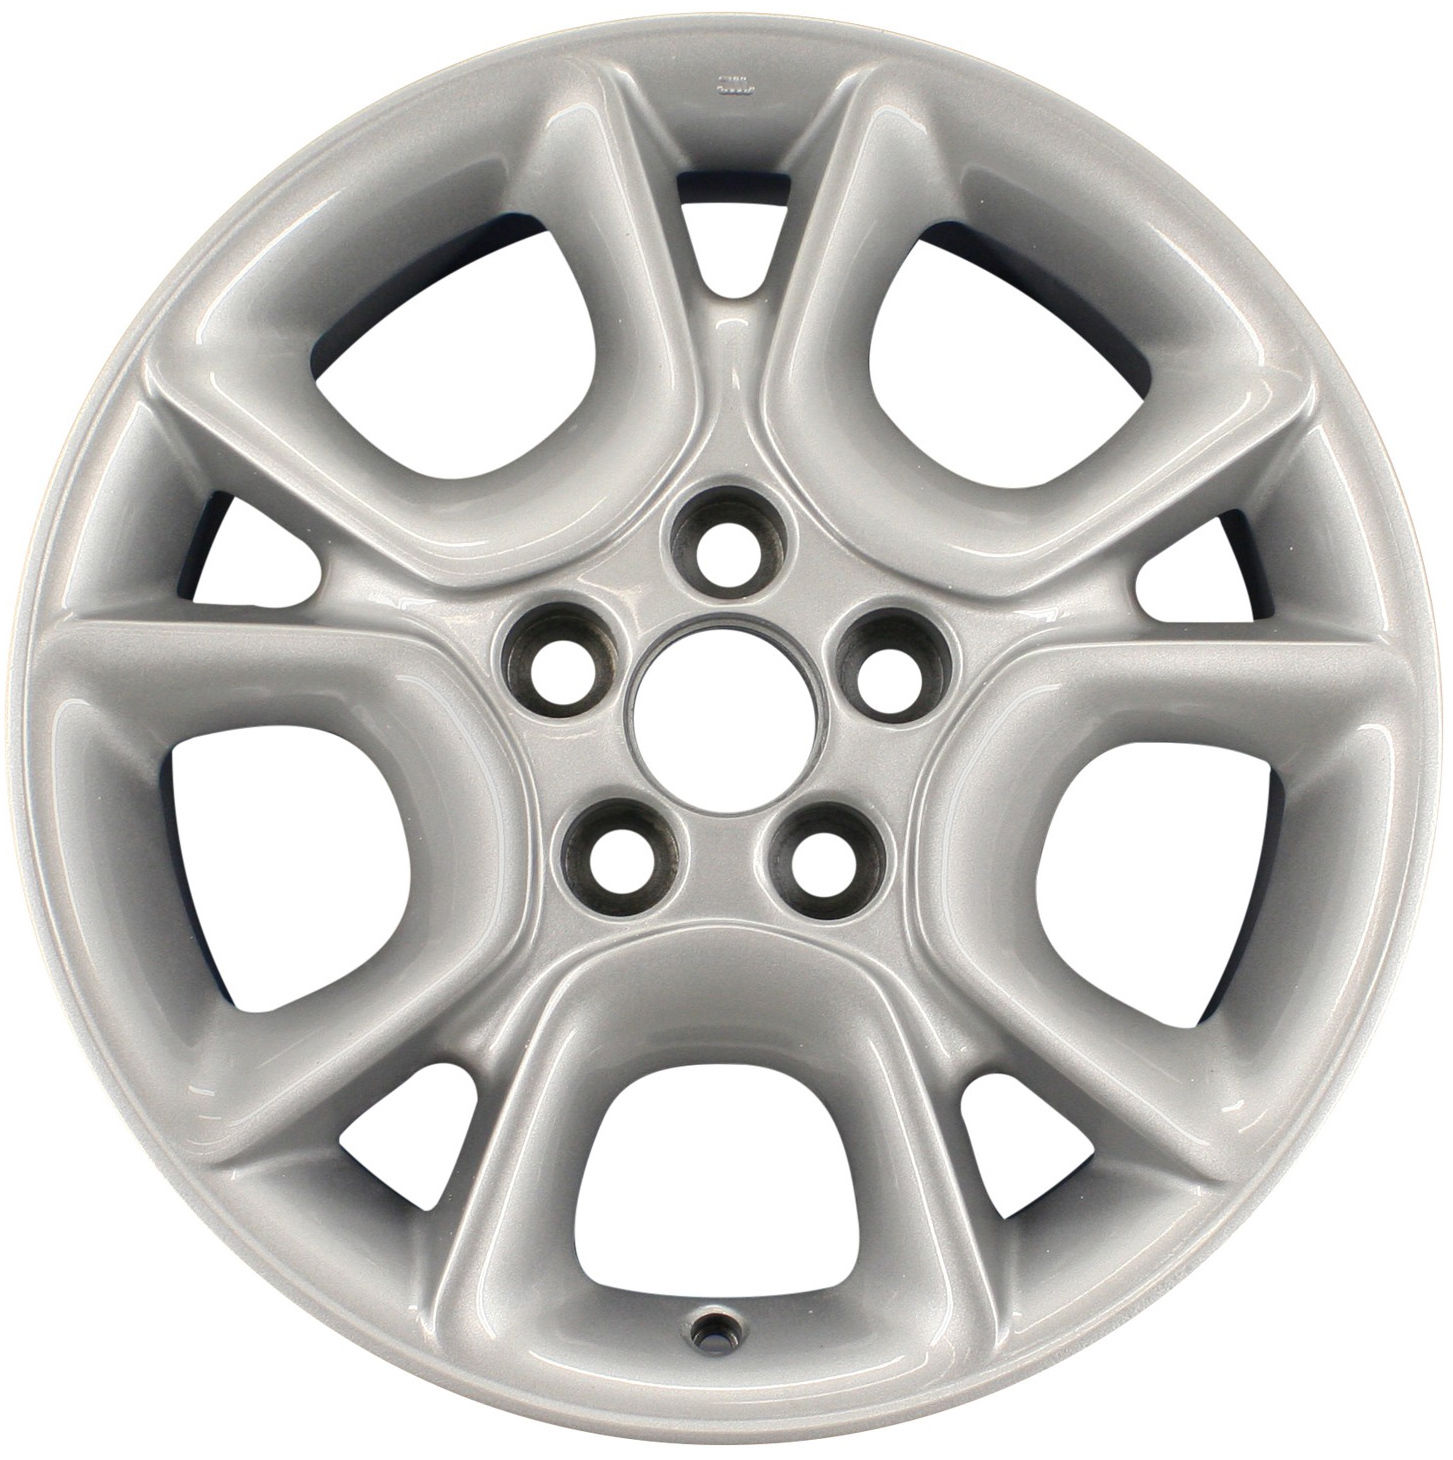 Perfect 144 Spoke Dayton Wire Wheels Inspiration - Electrical ...